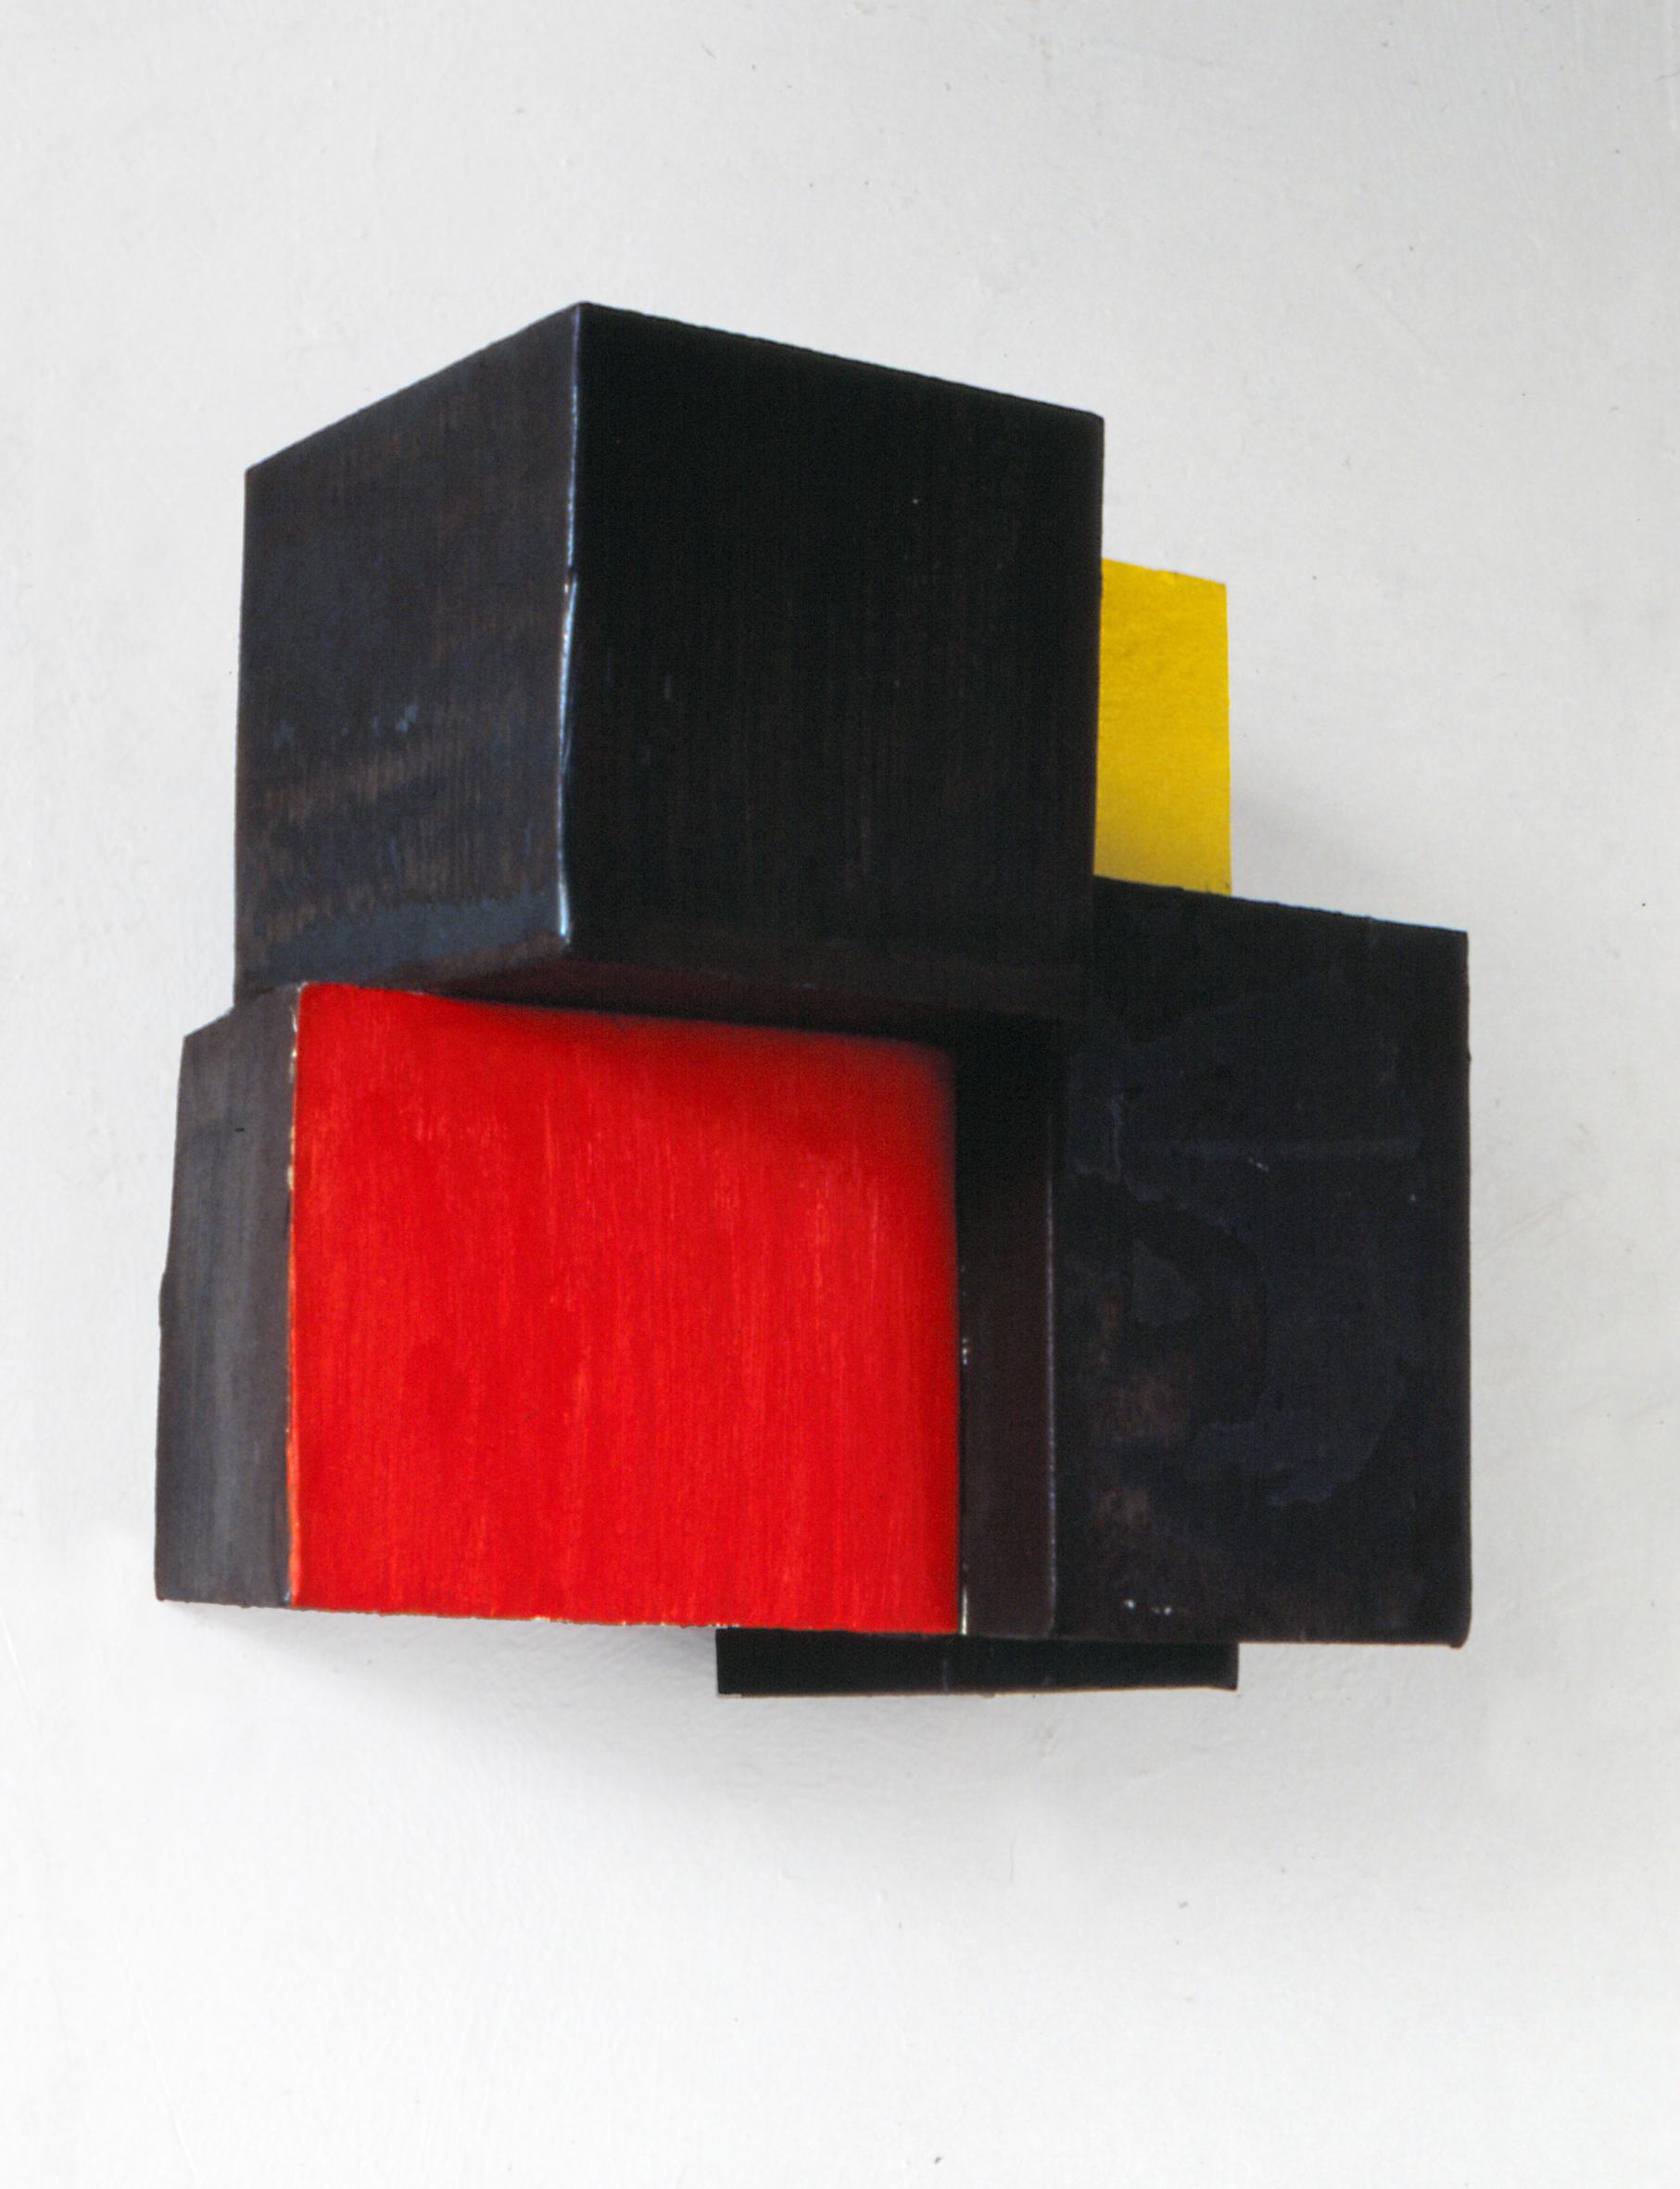 Pello Irazu   Happy (Feliz) , 1988 Steel structure and oil paint 22 x 22 x 14 cm Private collection, Barcelona © VEGAP, Bilbao, 2017